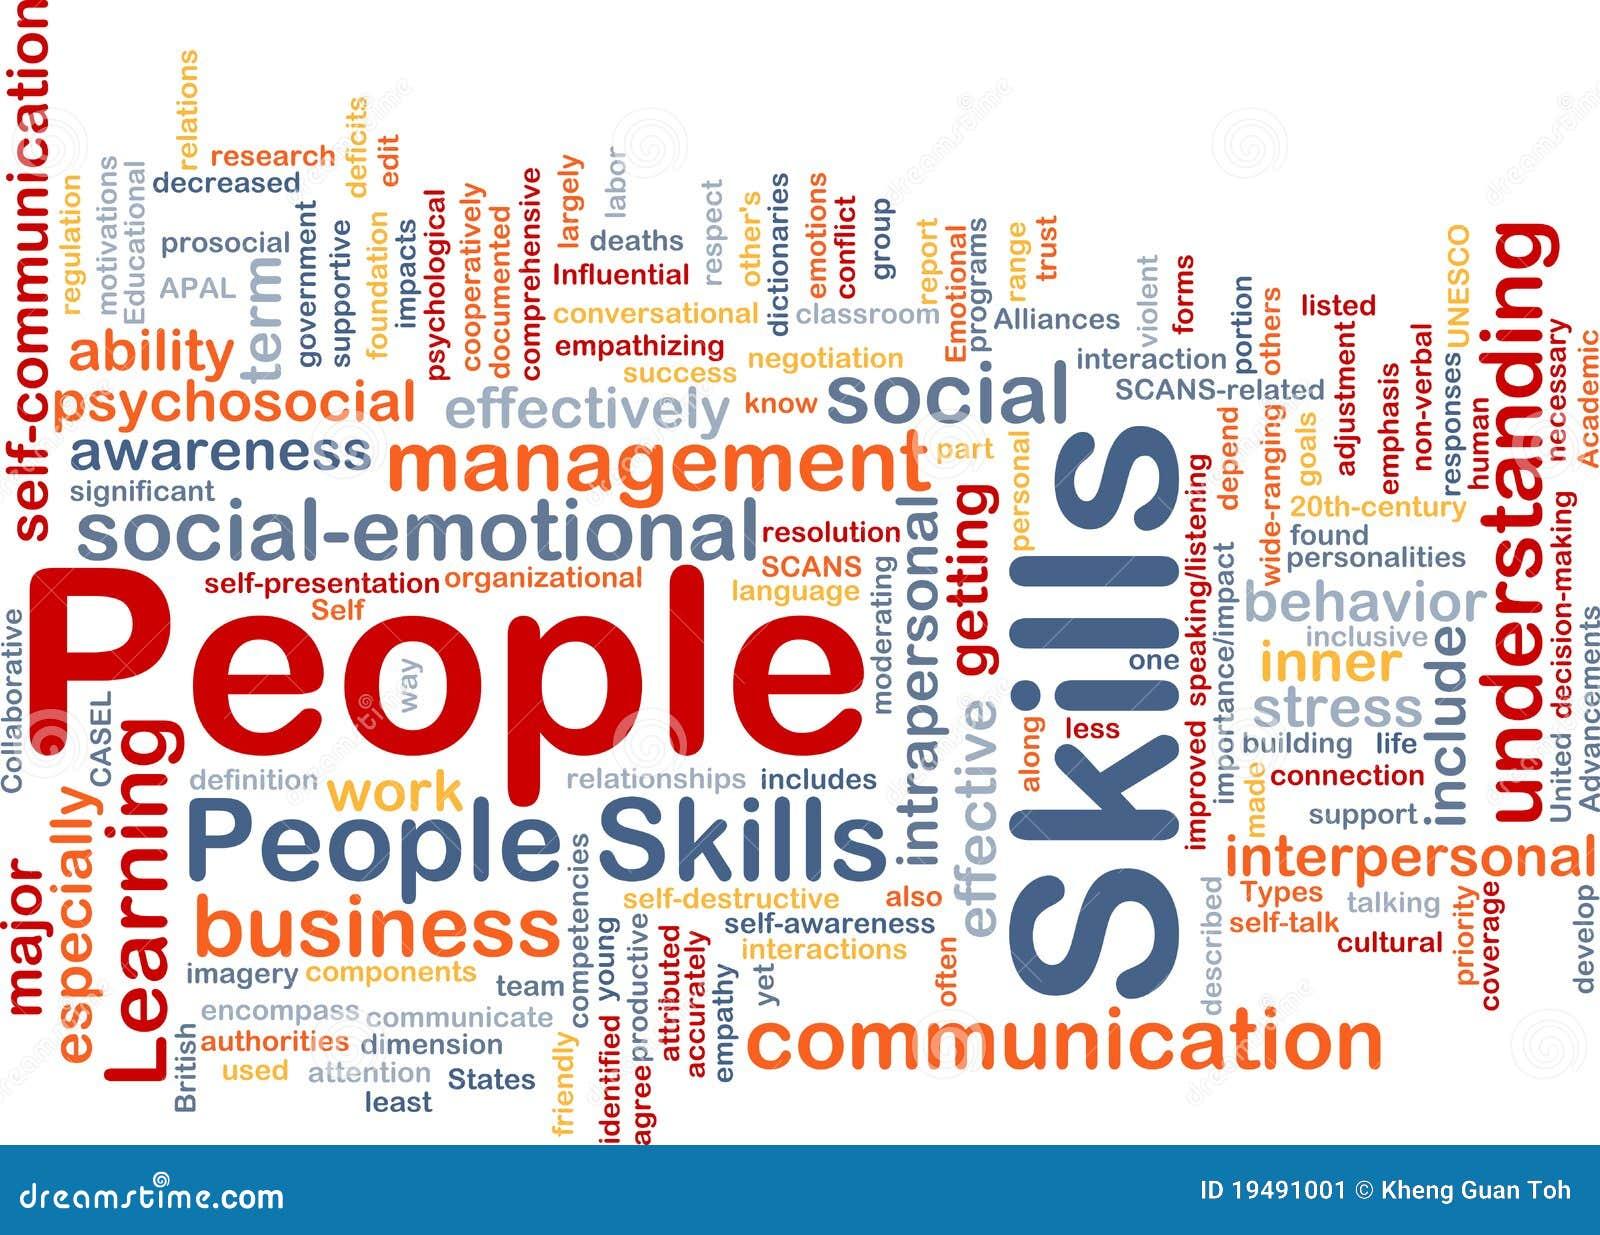 People Skills Background Concept Stock Image - Image: 19491001